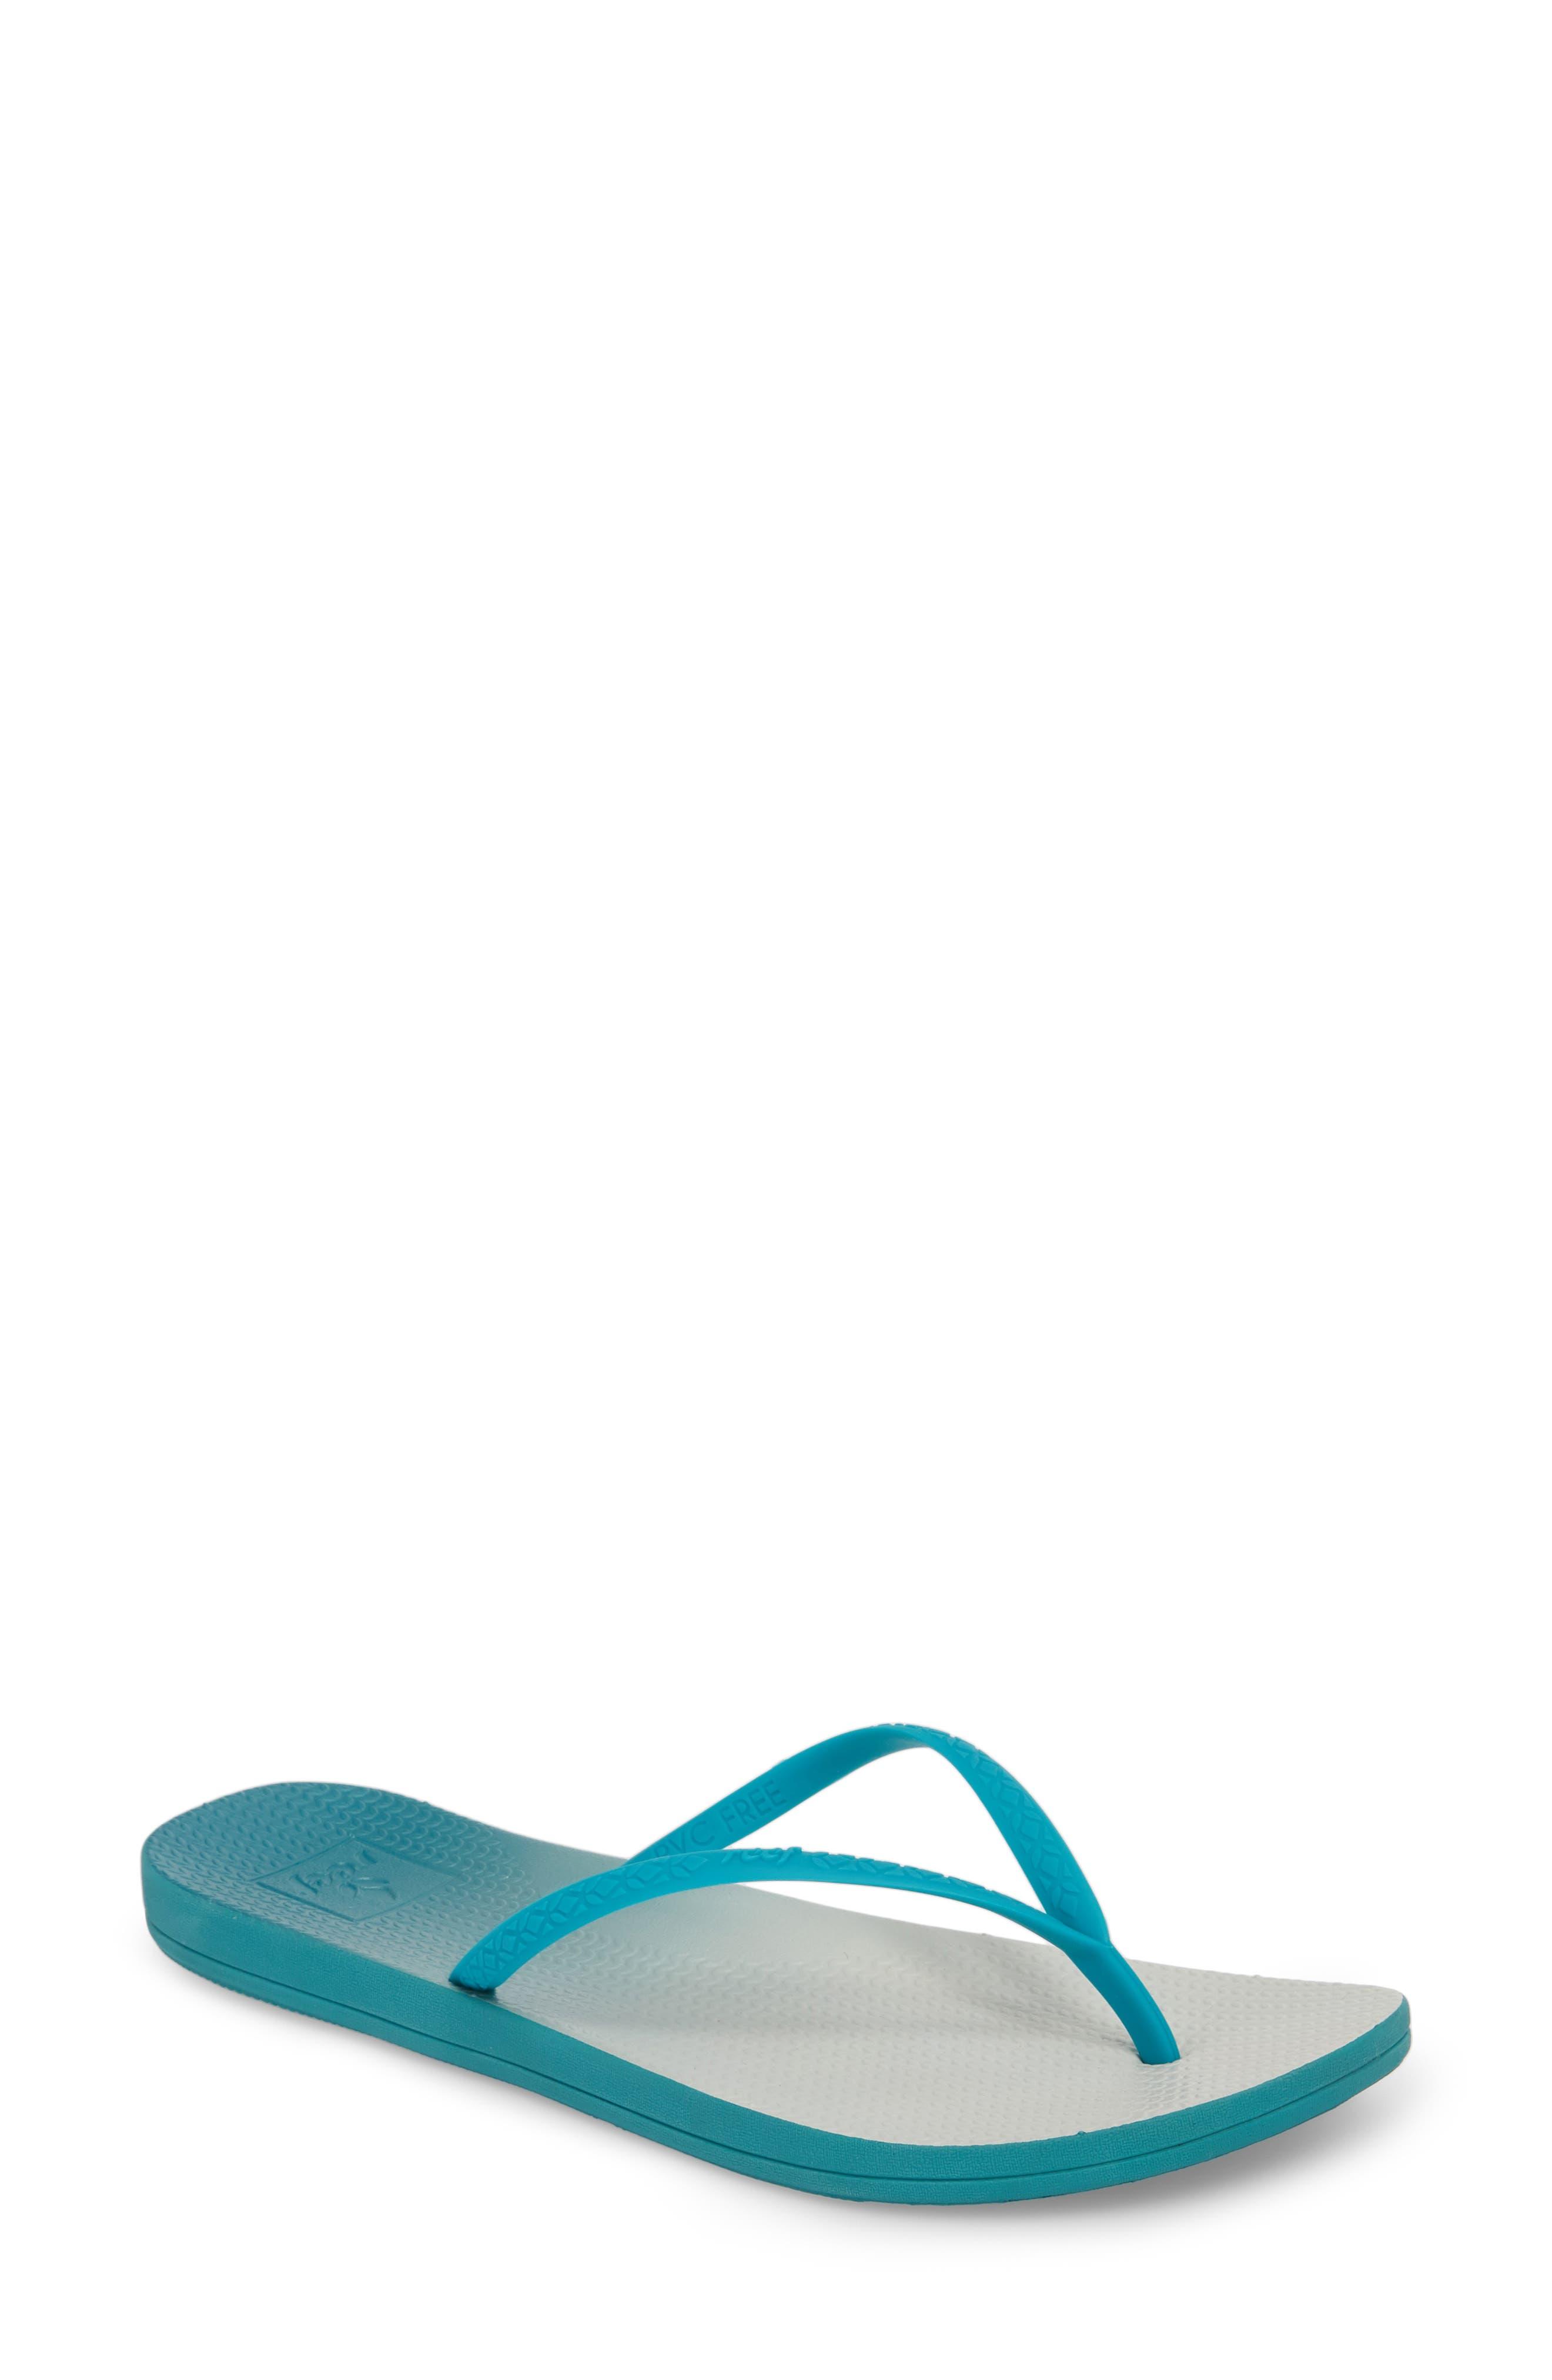 Reef Escape Lux Flip Flop (Women)